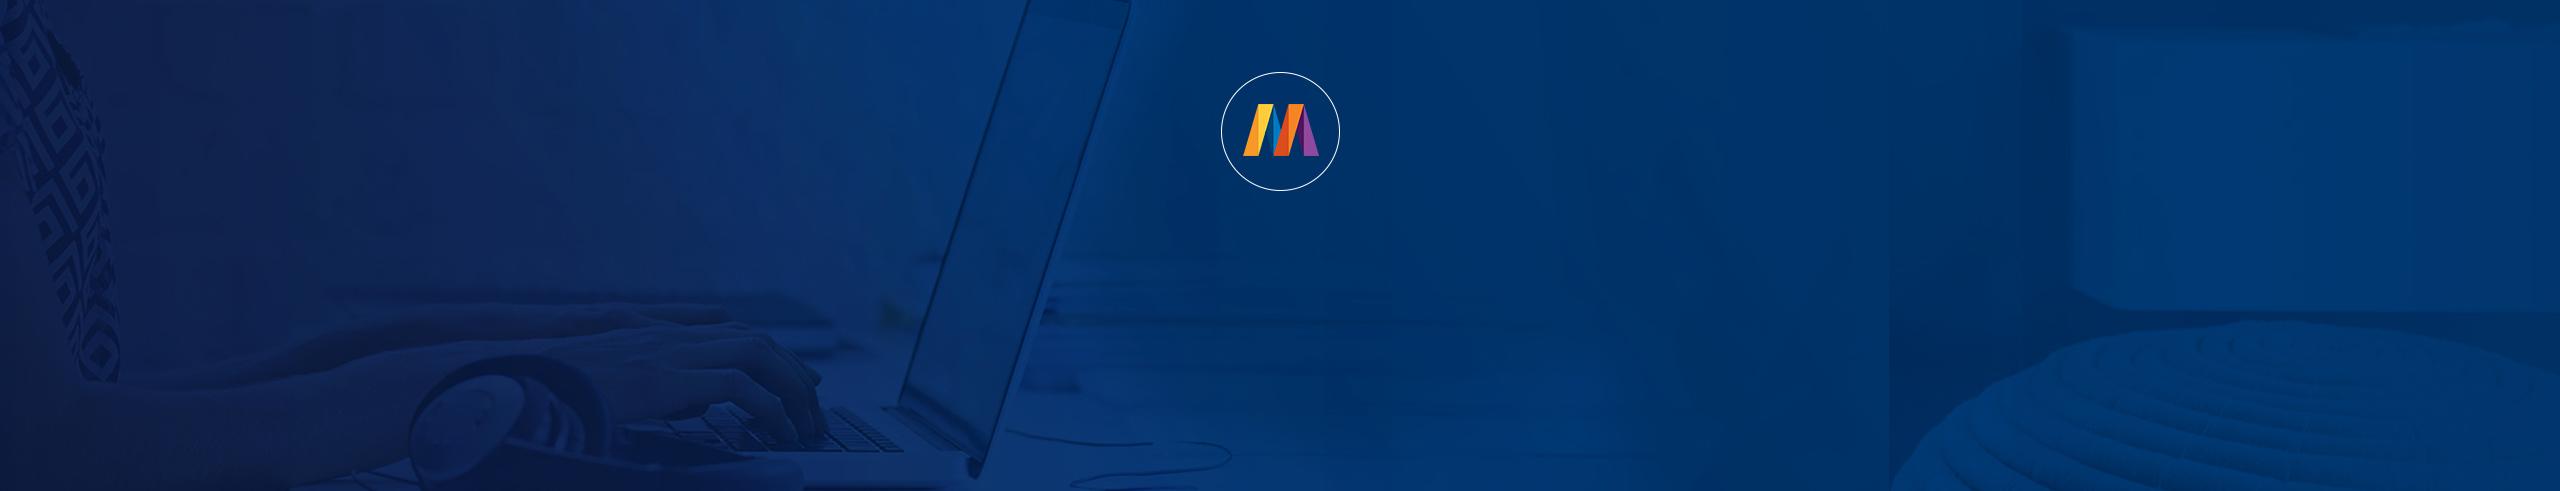 Esri Store | Buy ArcGIS Software Online